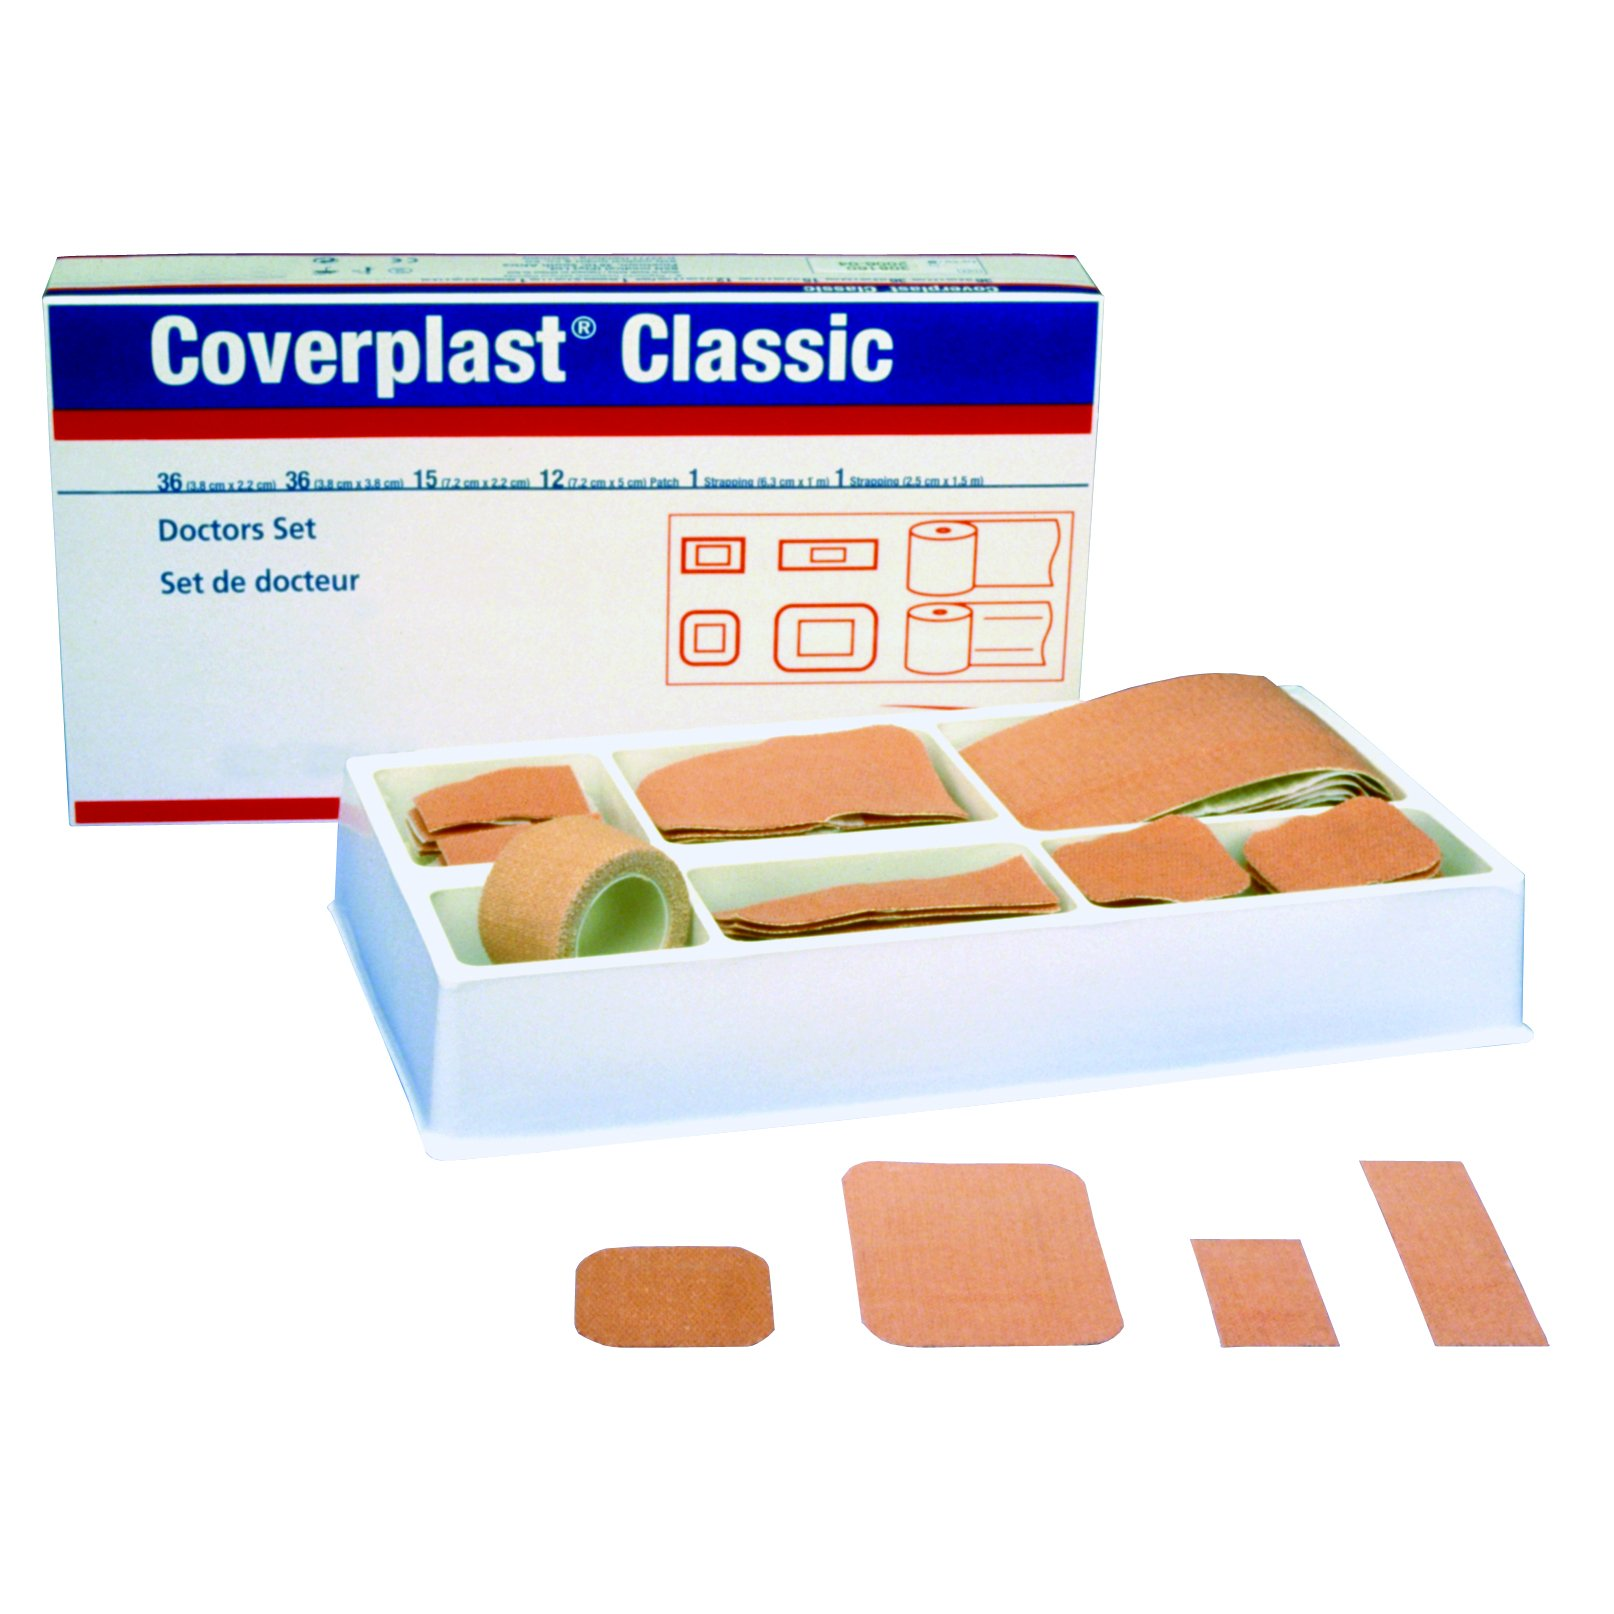 Coverplast Doctor's Set